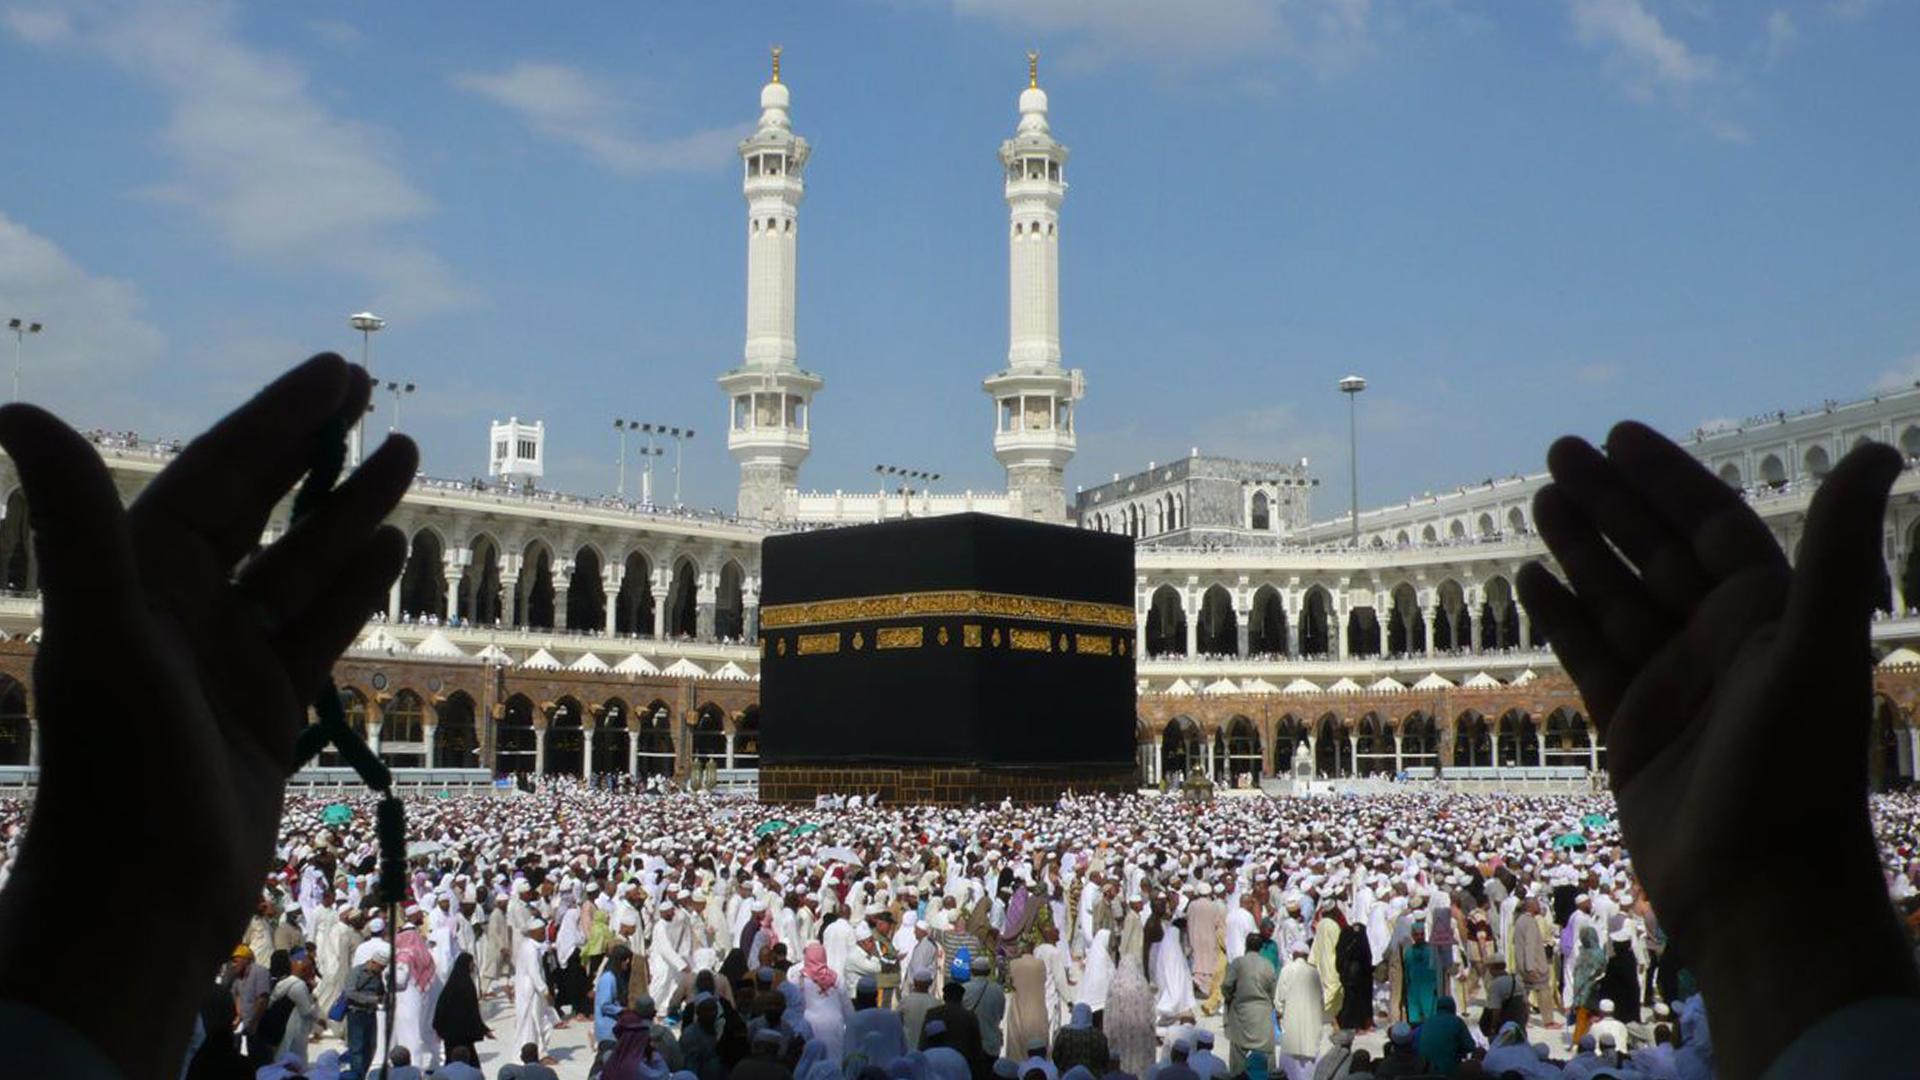 Arabia Saudite ndalon pelegrinazhet e Mekës prej koronavirusit